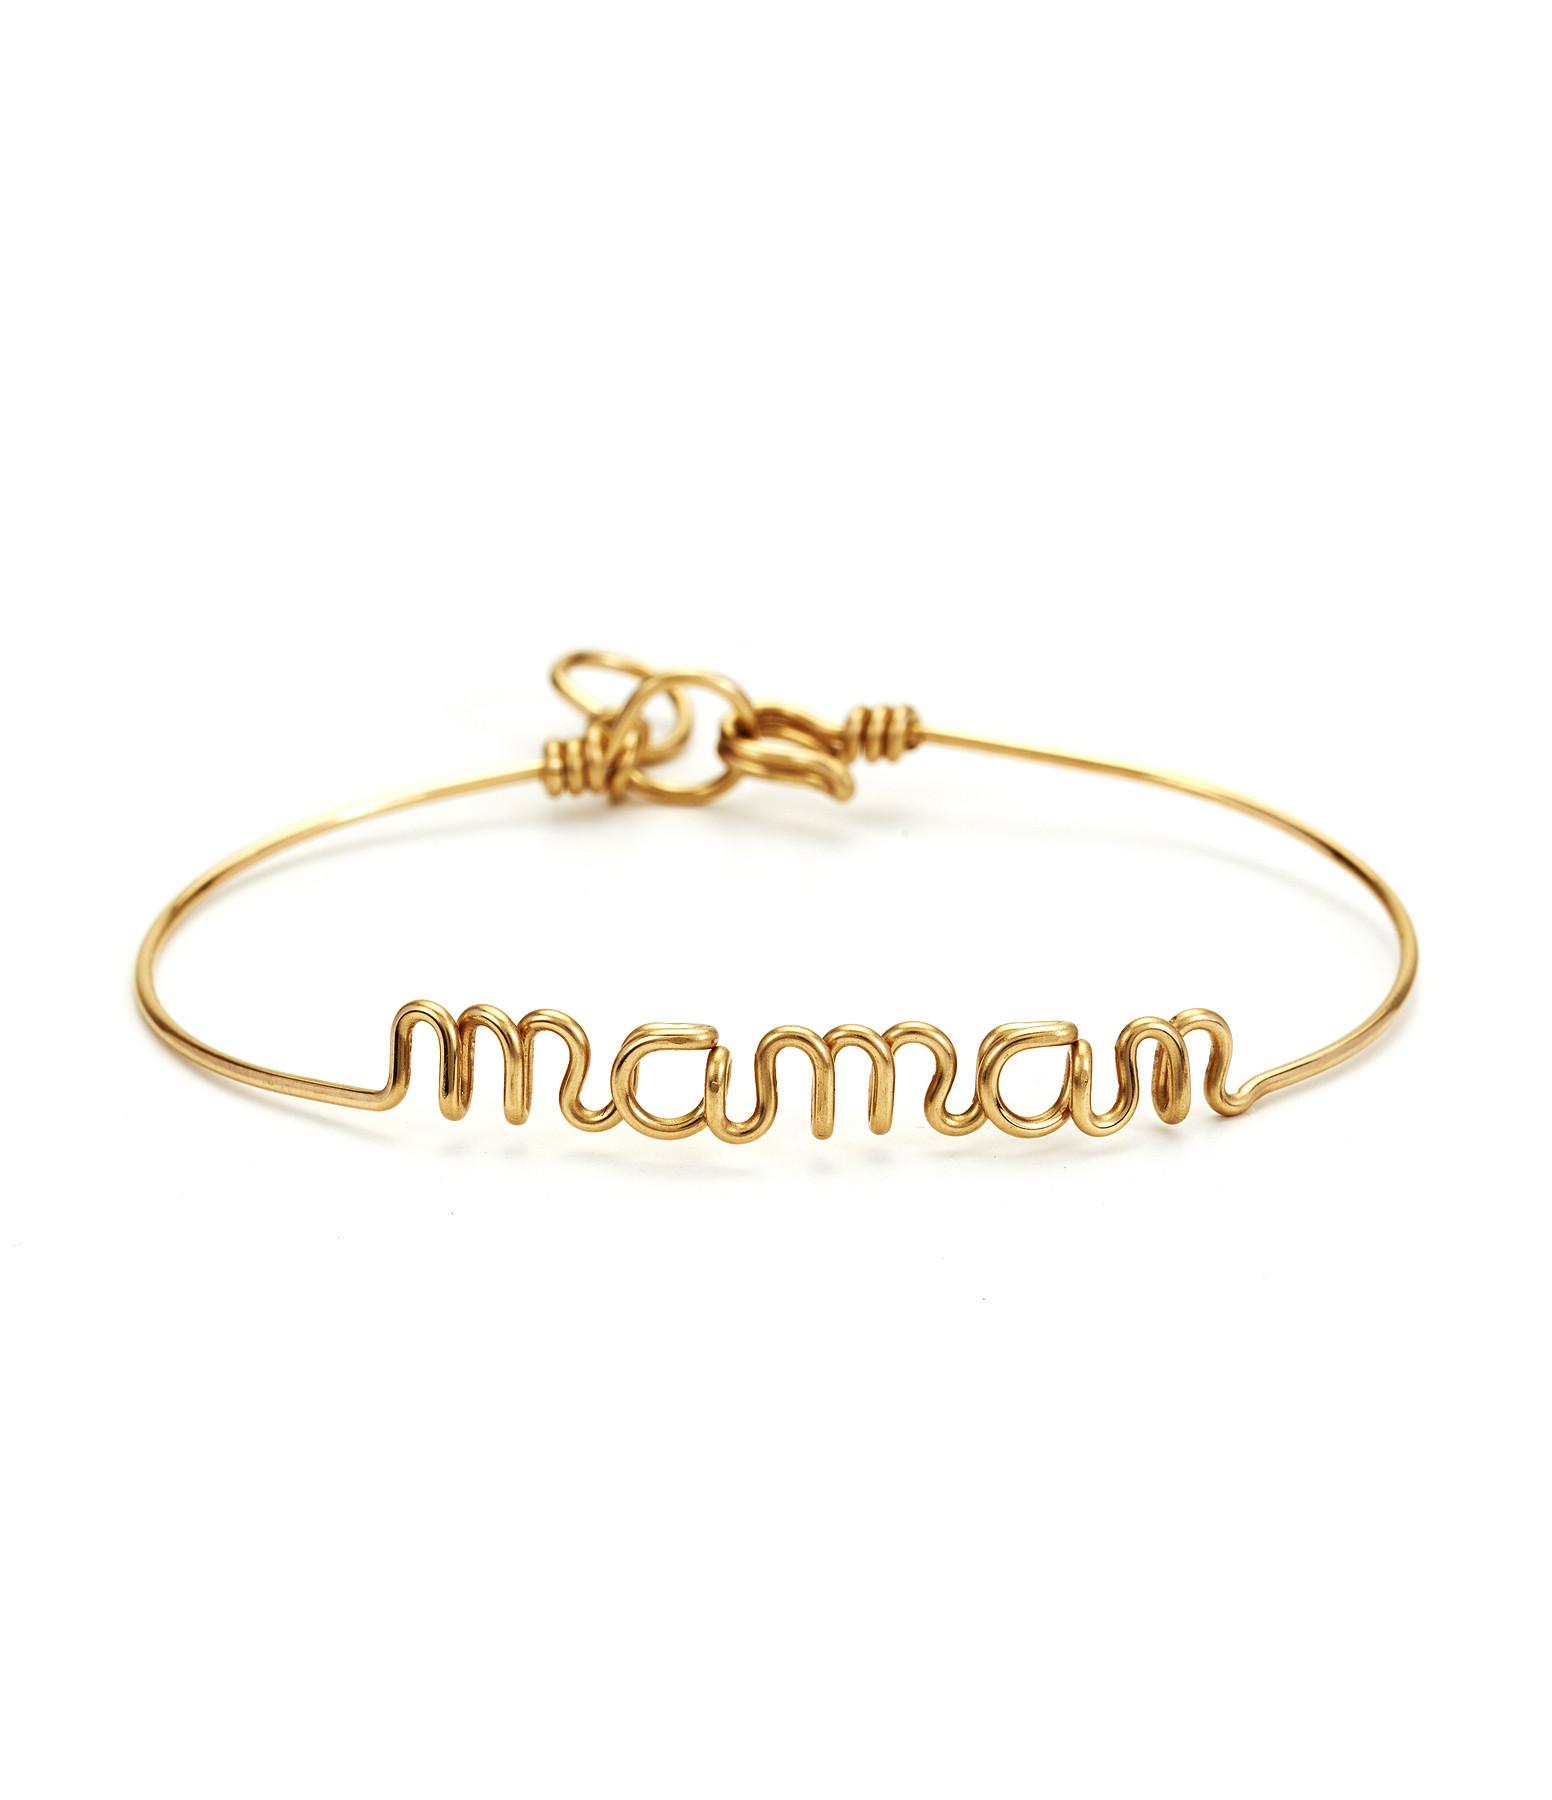 Bracelet Fil Maman Gold Filled - ATELIER PAULIN